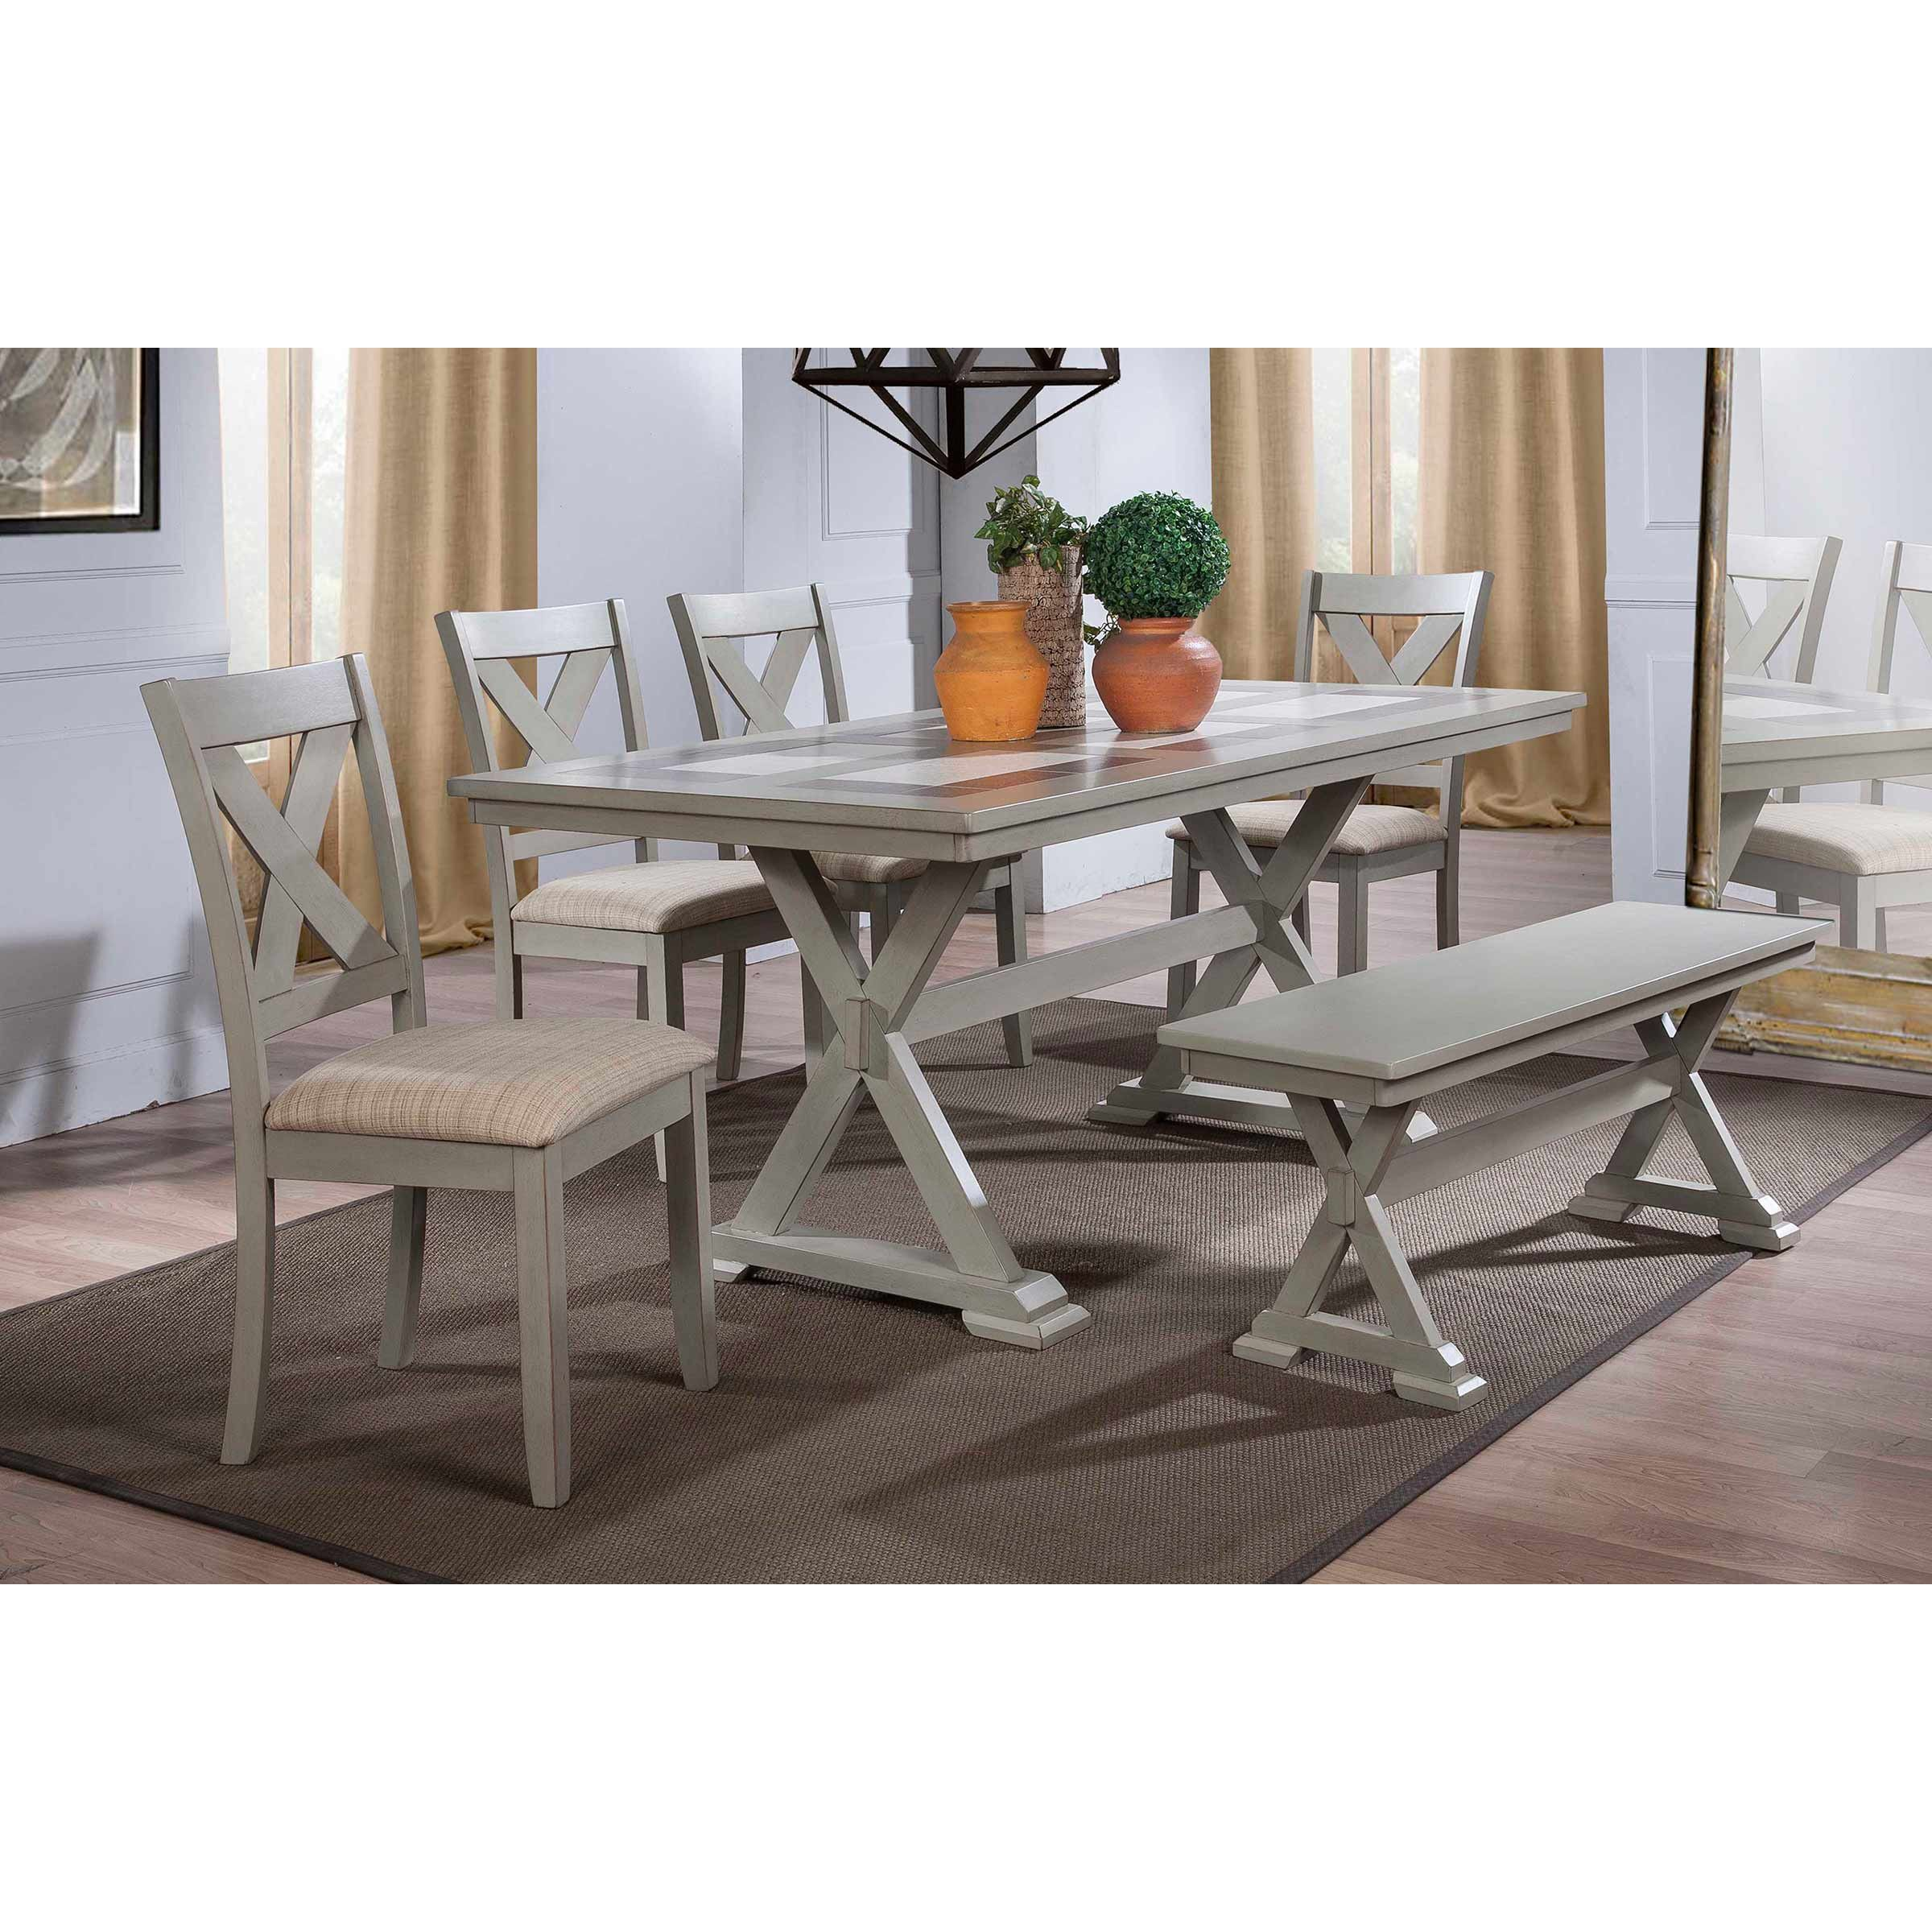 Lark manor paras arm chair amp reviews wayfair ca - Lark Manor Dining Table